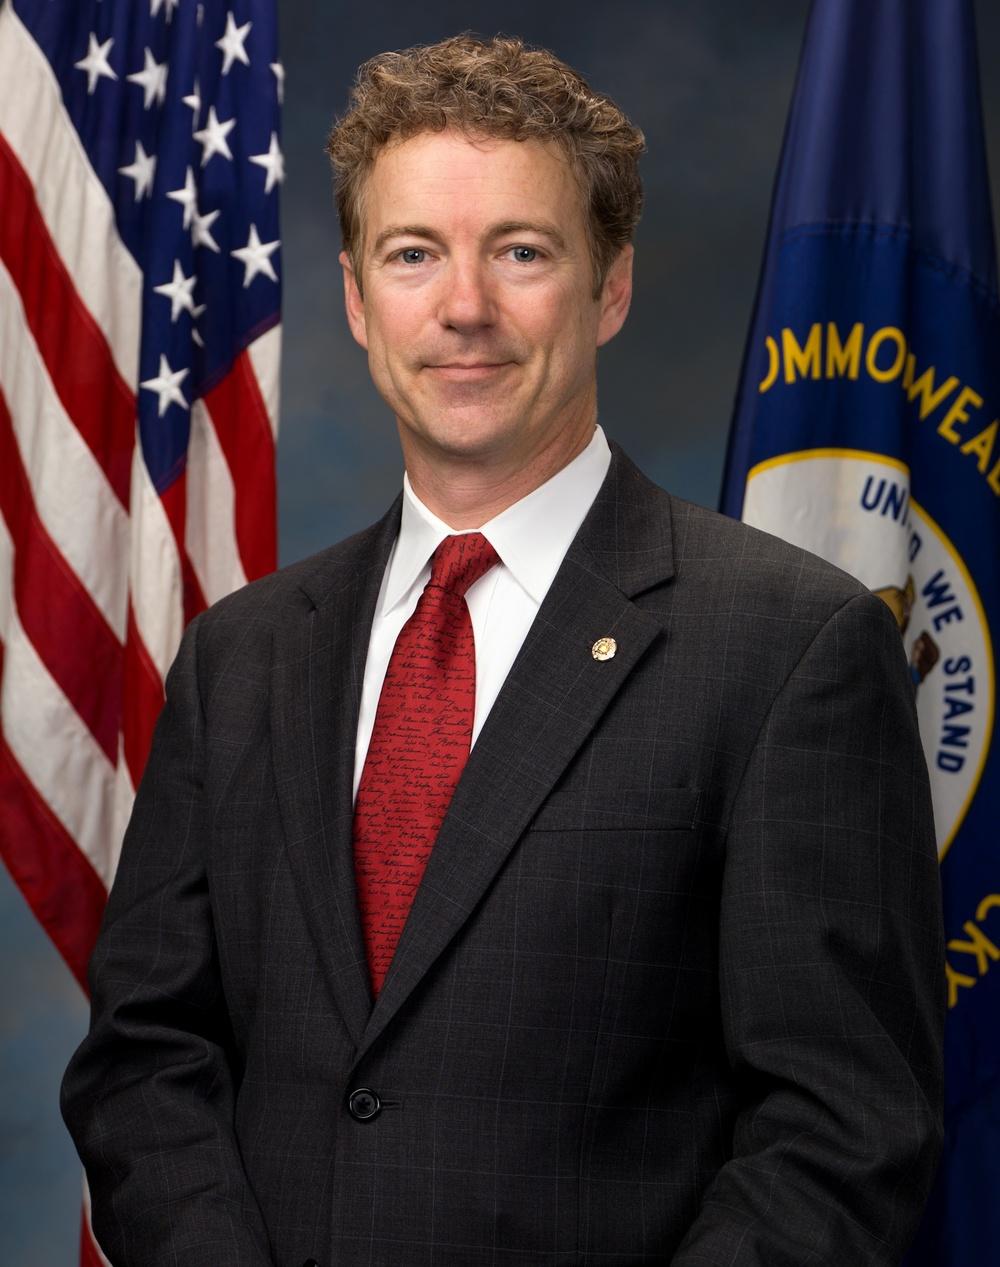 Click photo to download. Caption: U.S. Senator Rand Paul (R-KY). Credit: U.S. Senate.